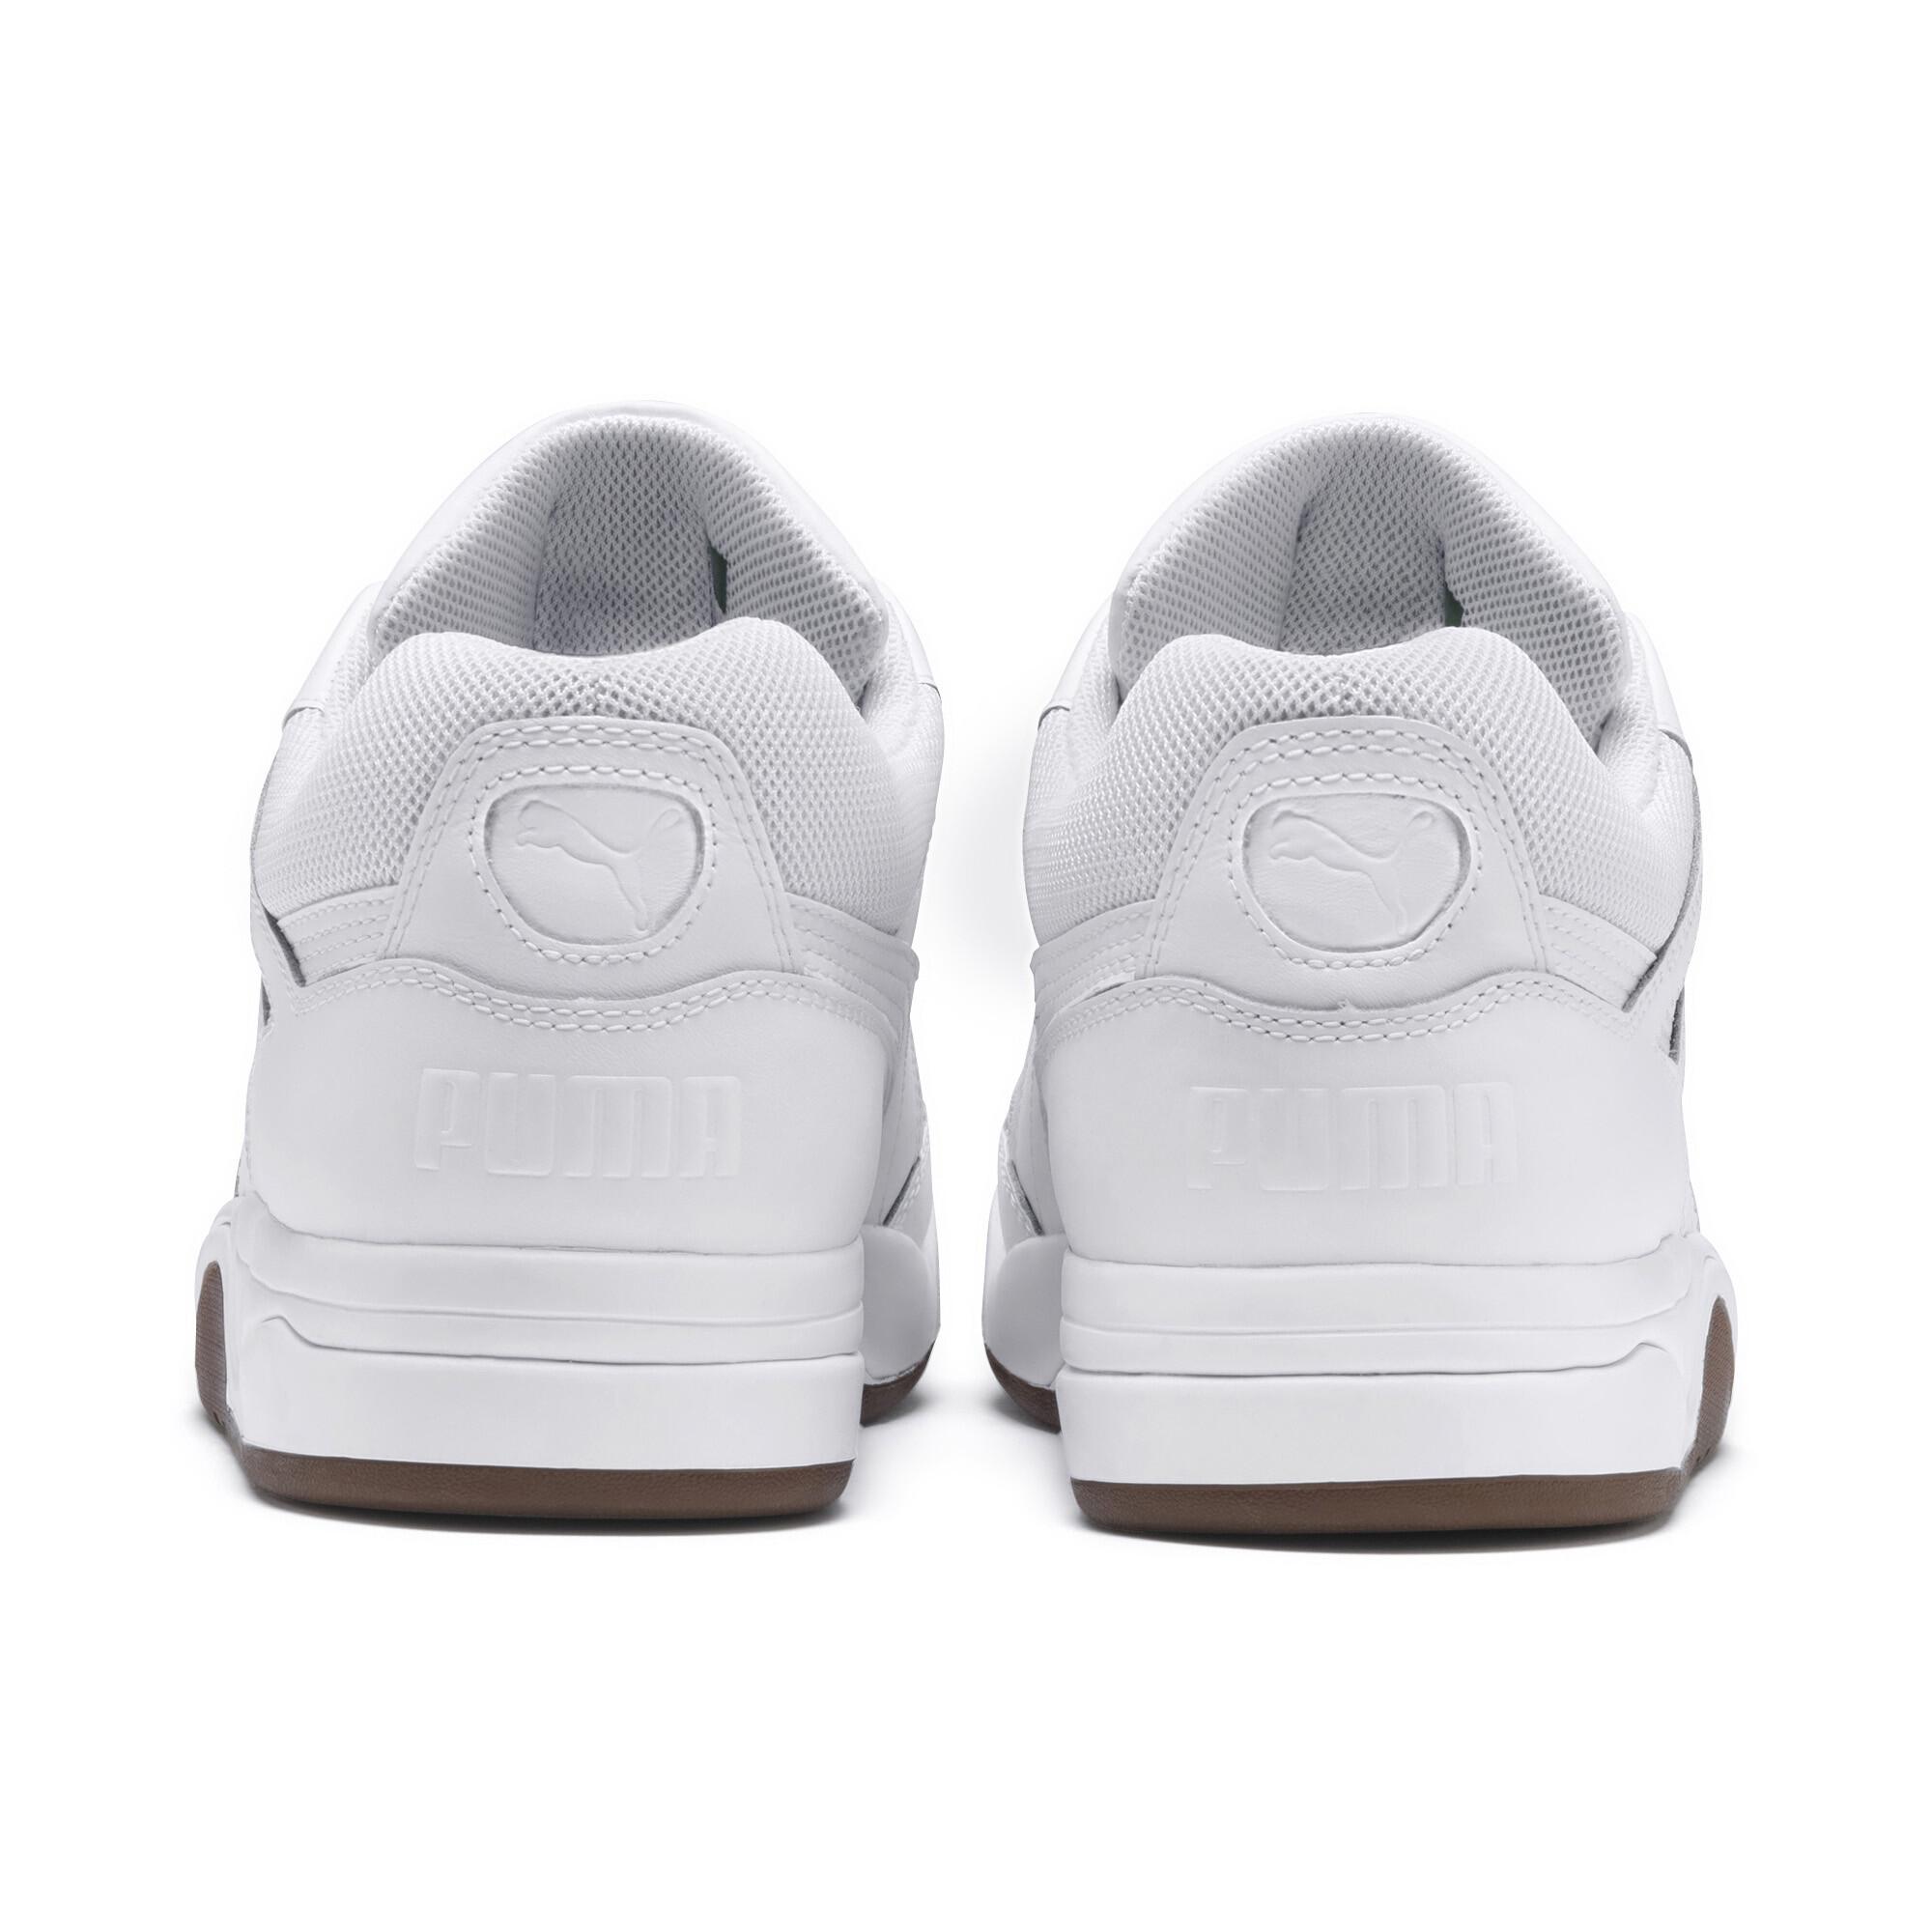 Indexbild 18 - PUMA Palace Guard Sneaker Unisex Schuhe Sport Classics Neu